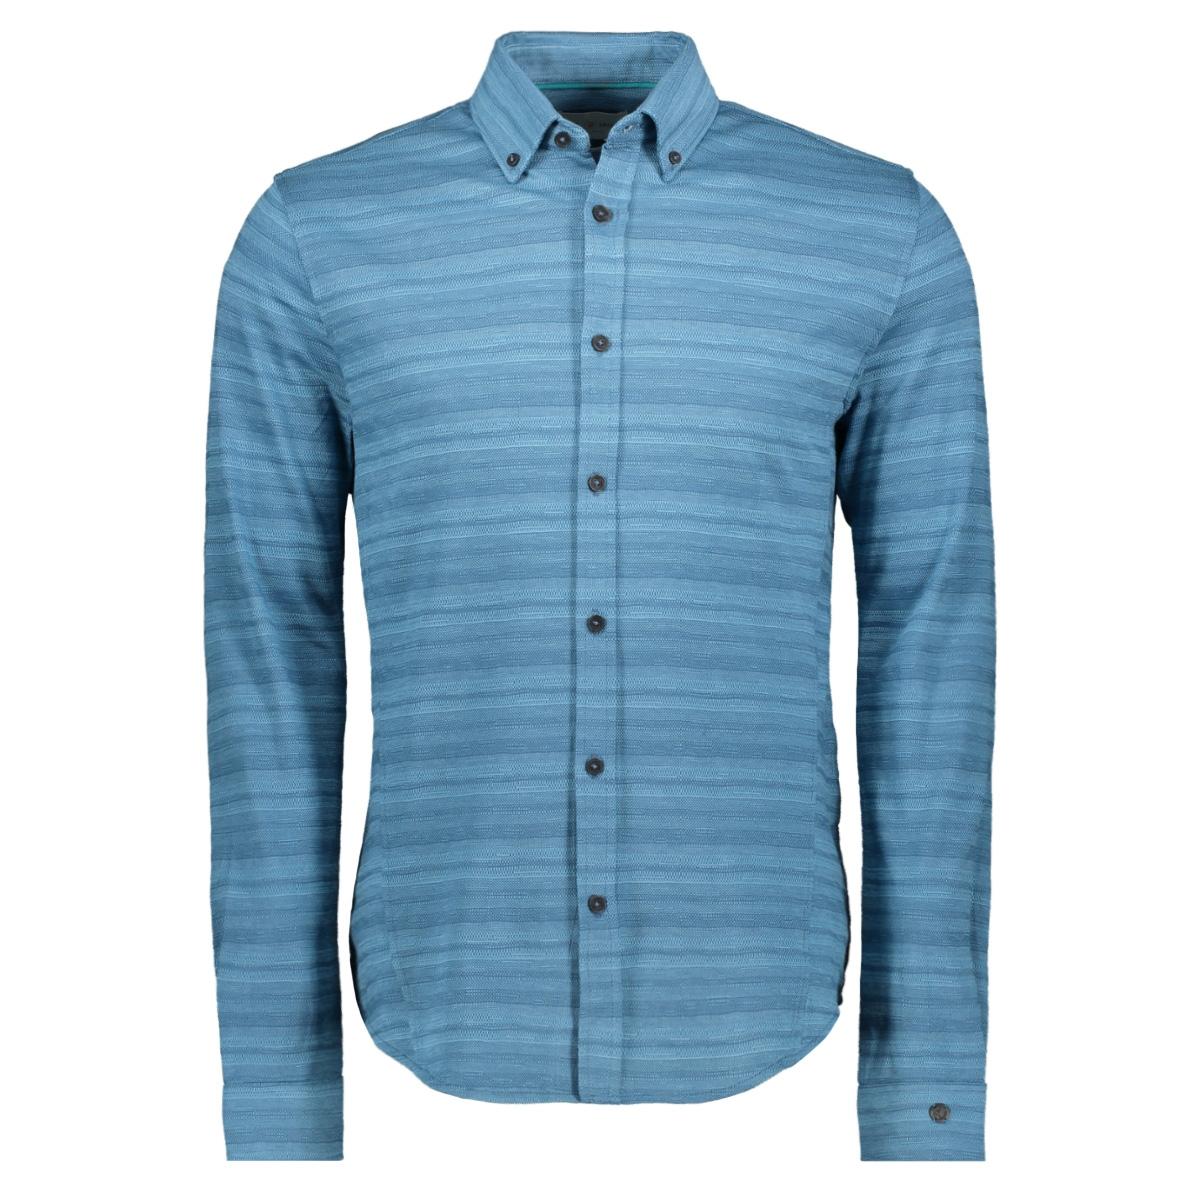 pique shirt csi201604 cast iron overhemd 5230